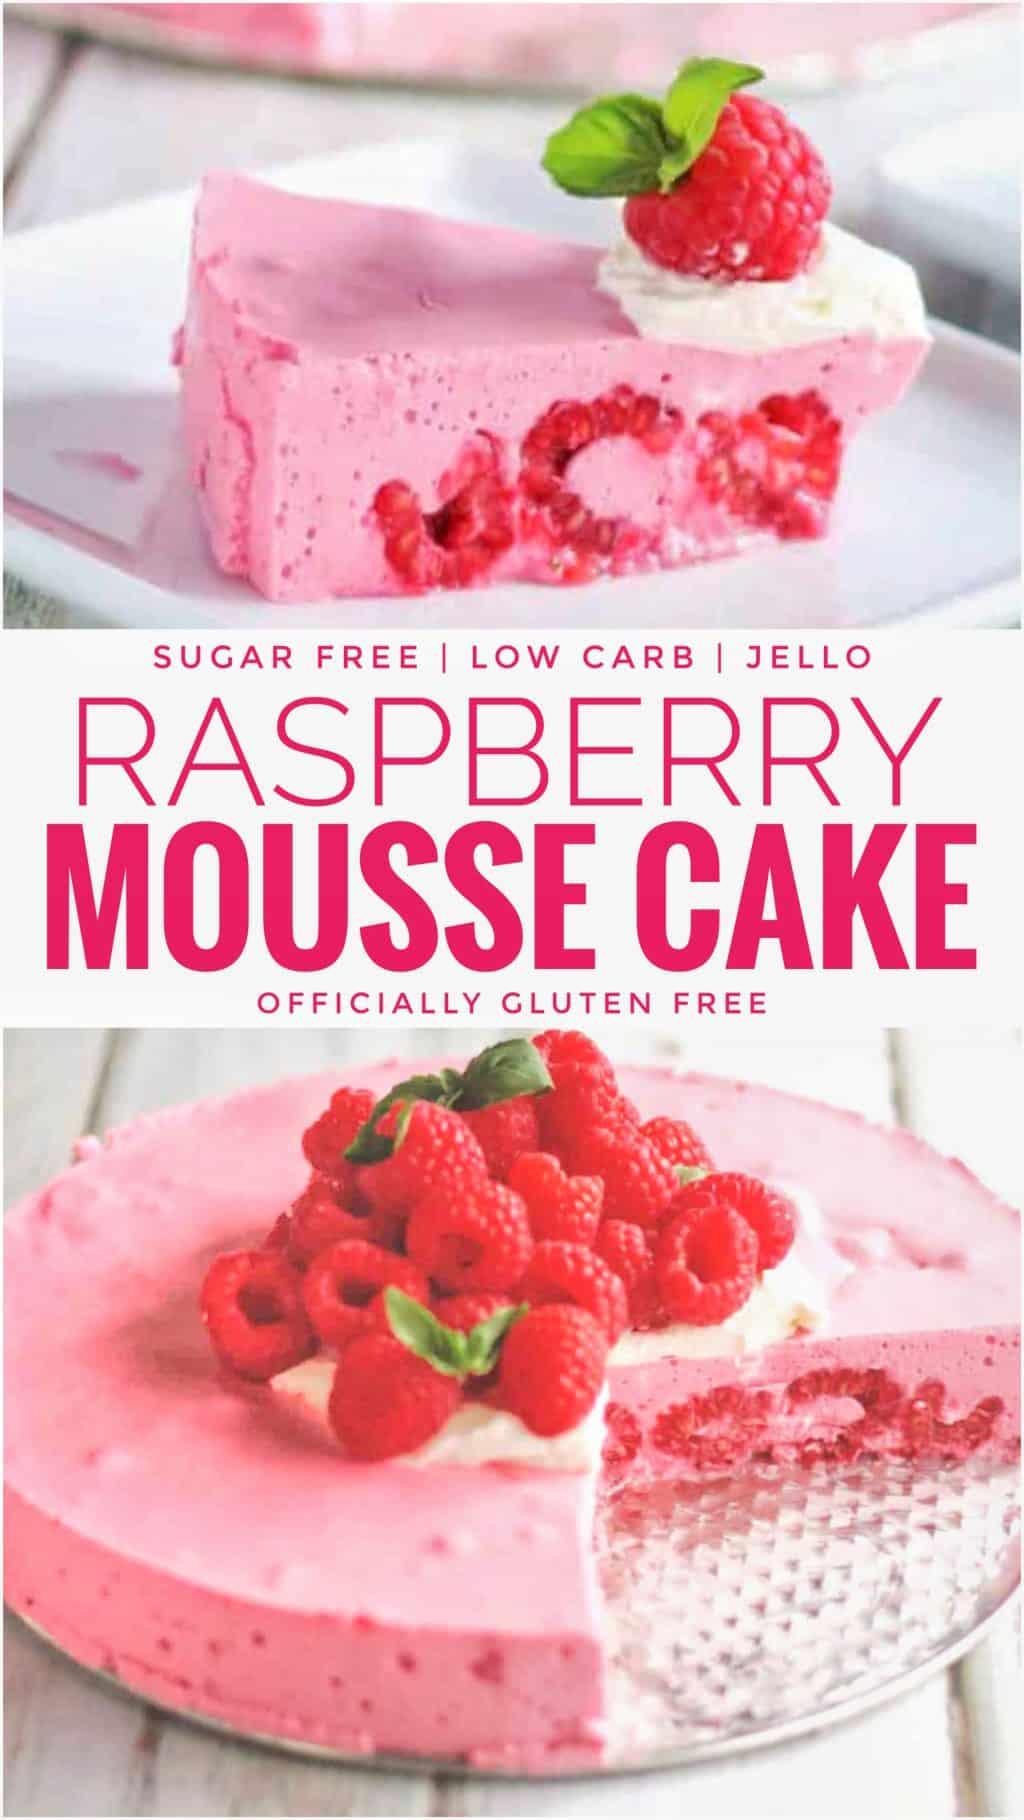 Sugar Free Raspberry Mousse Cake